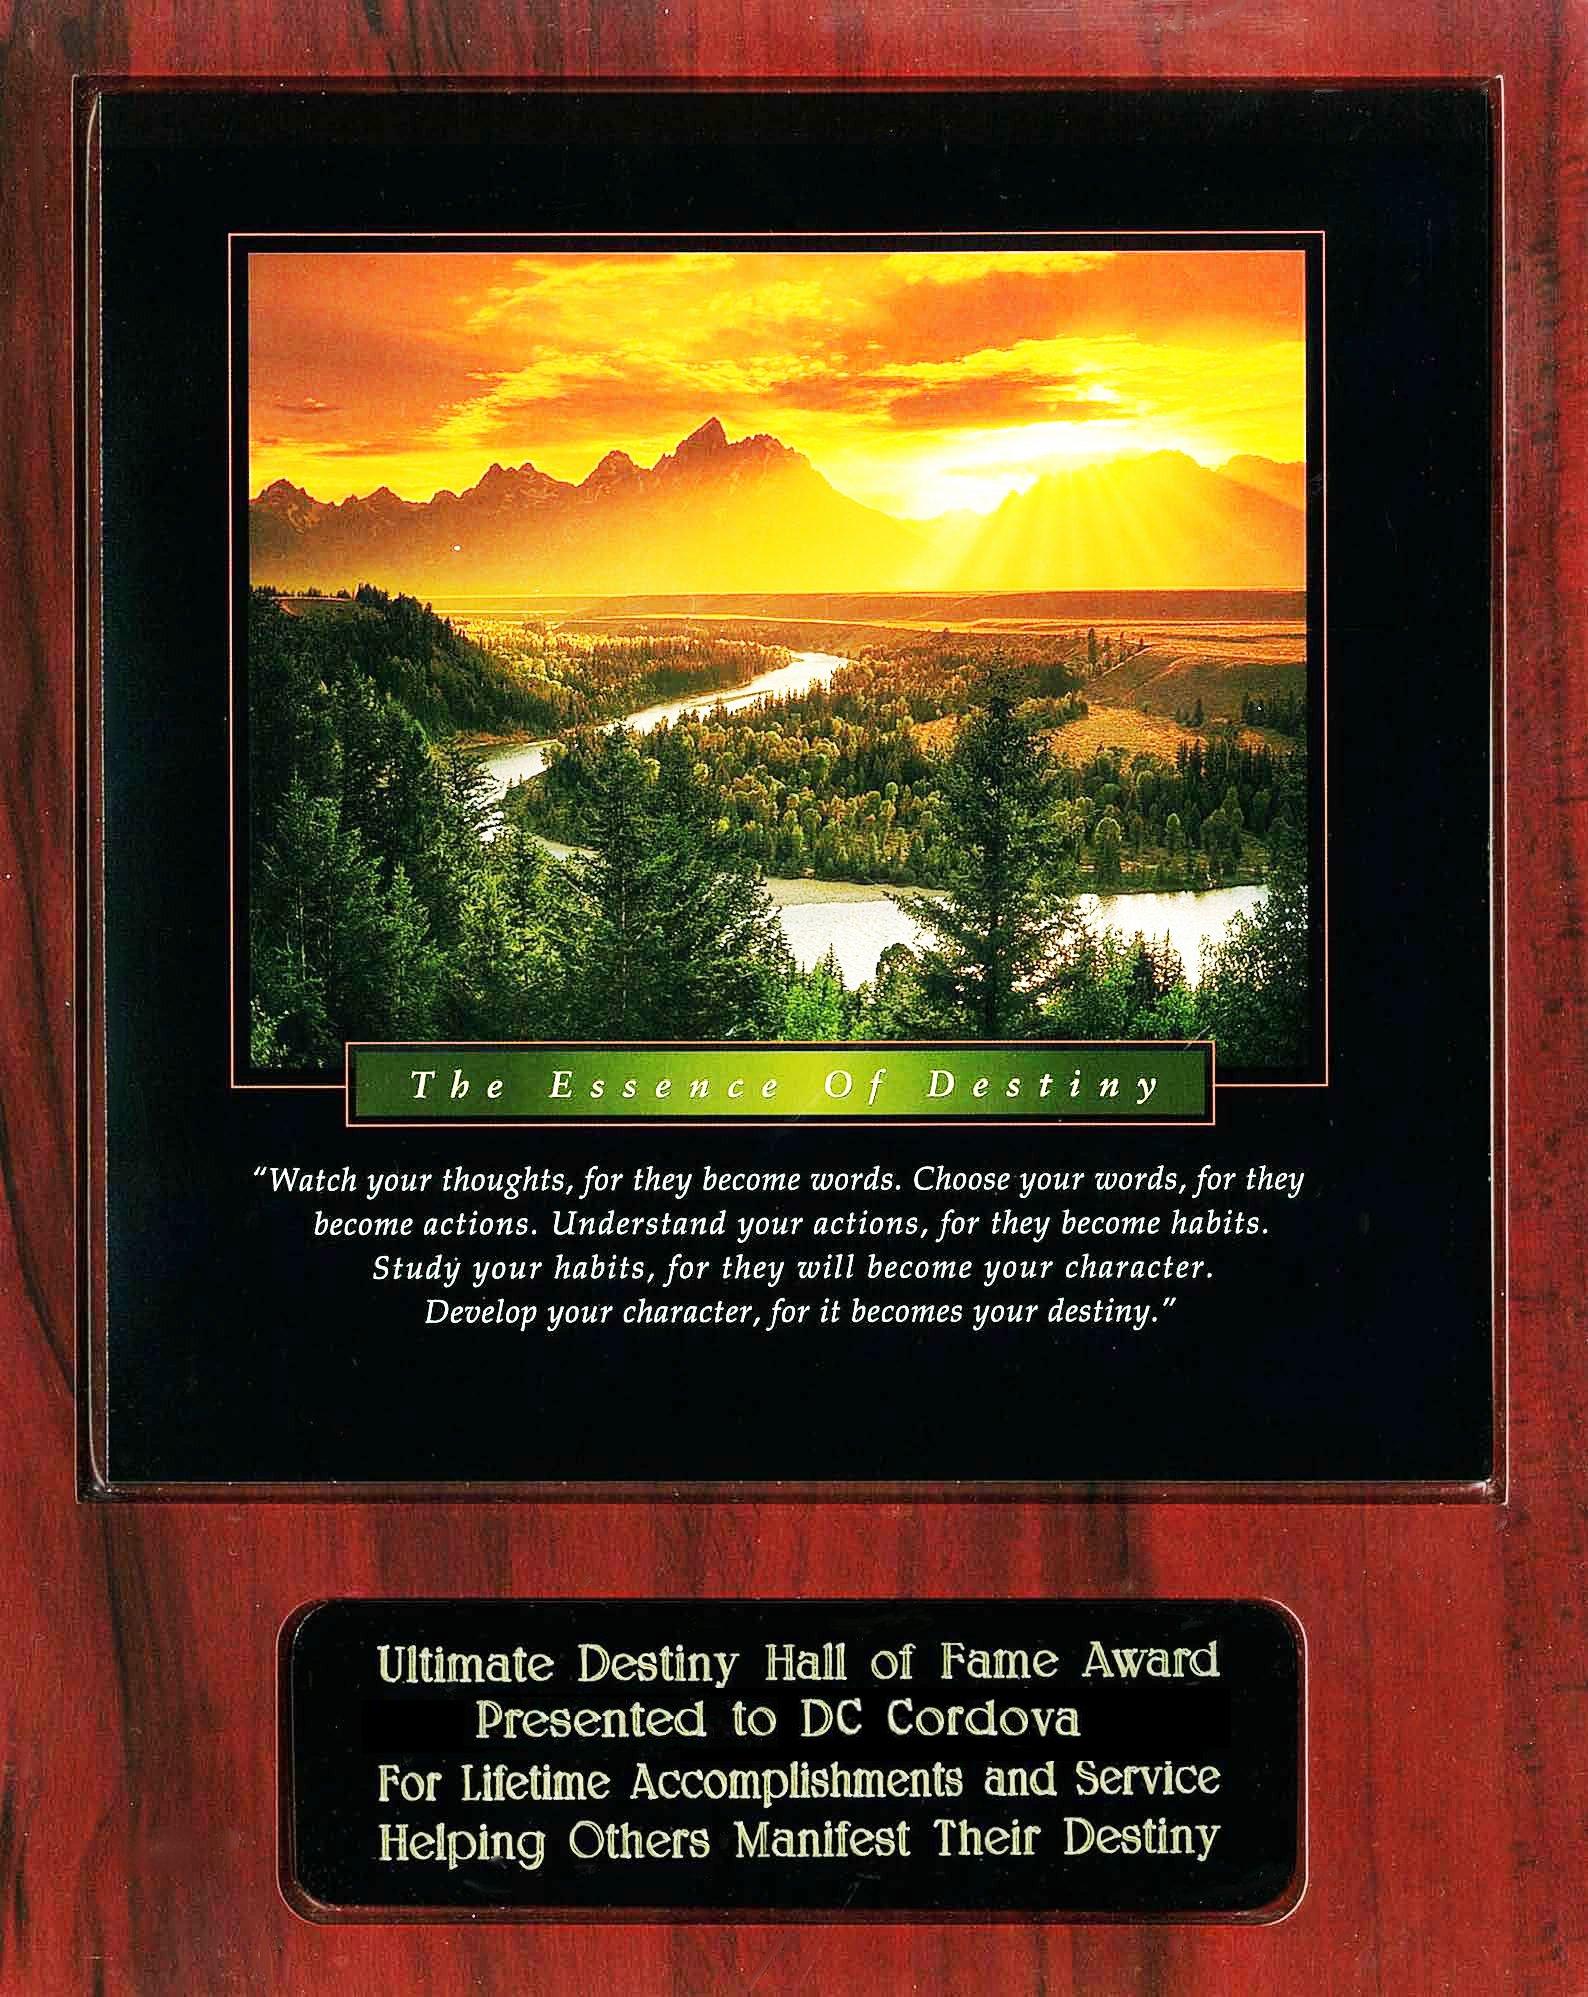 DC Cordova Ultimate Destiny Hall of Fame Award Recipient Plaque